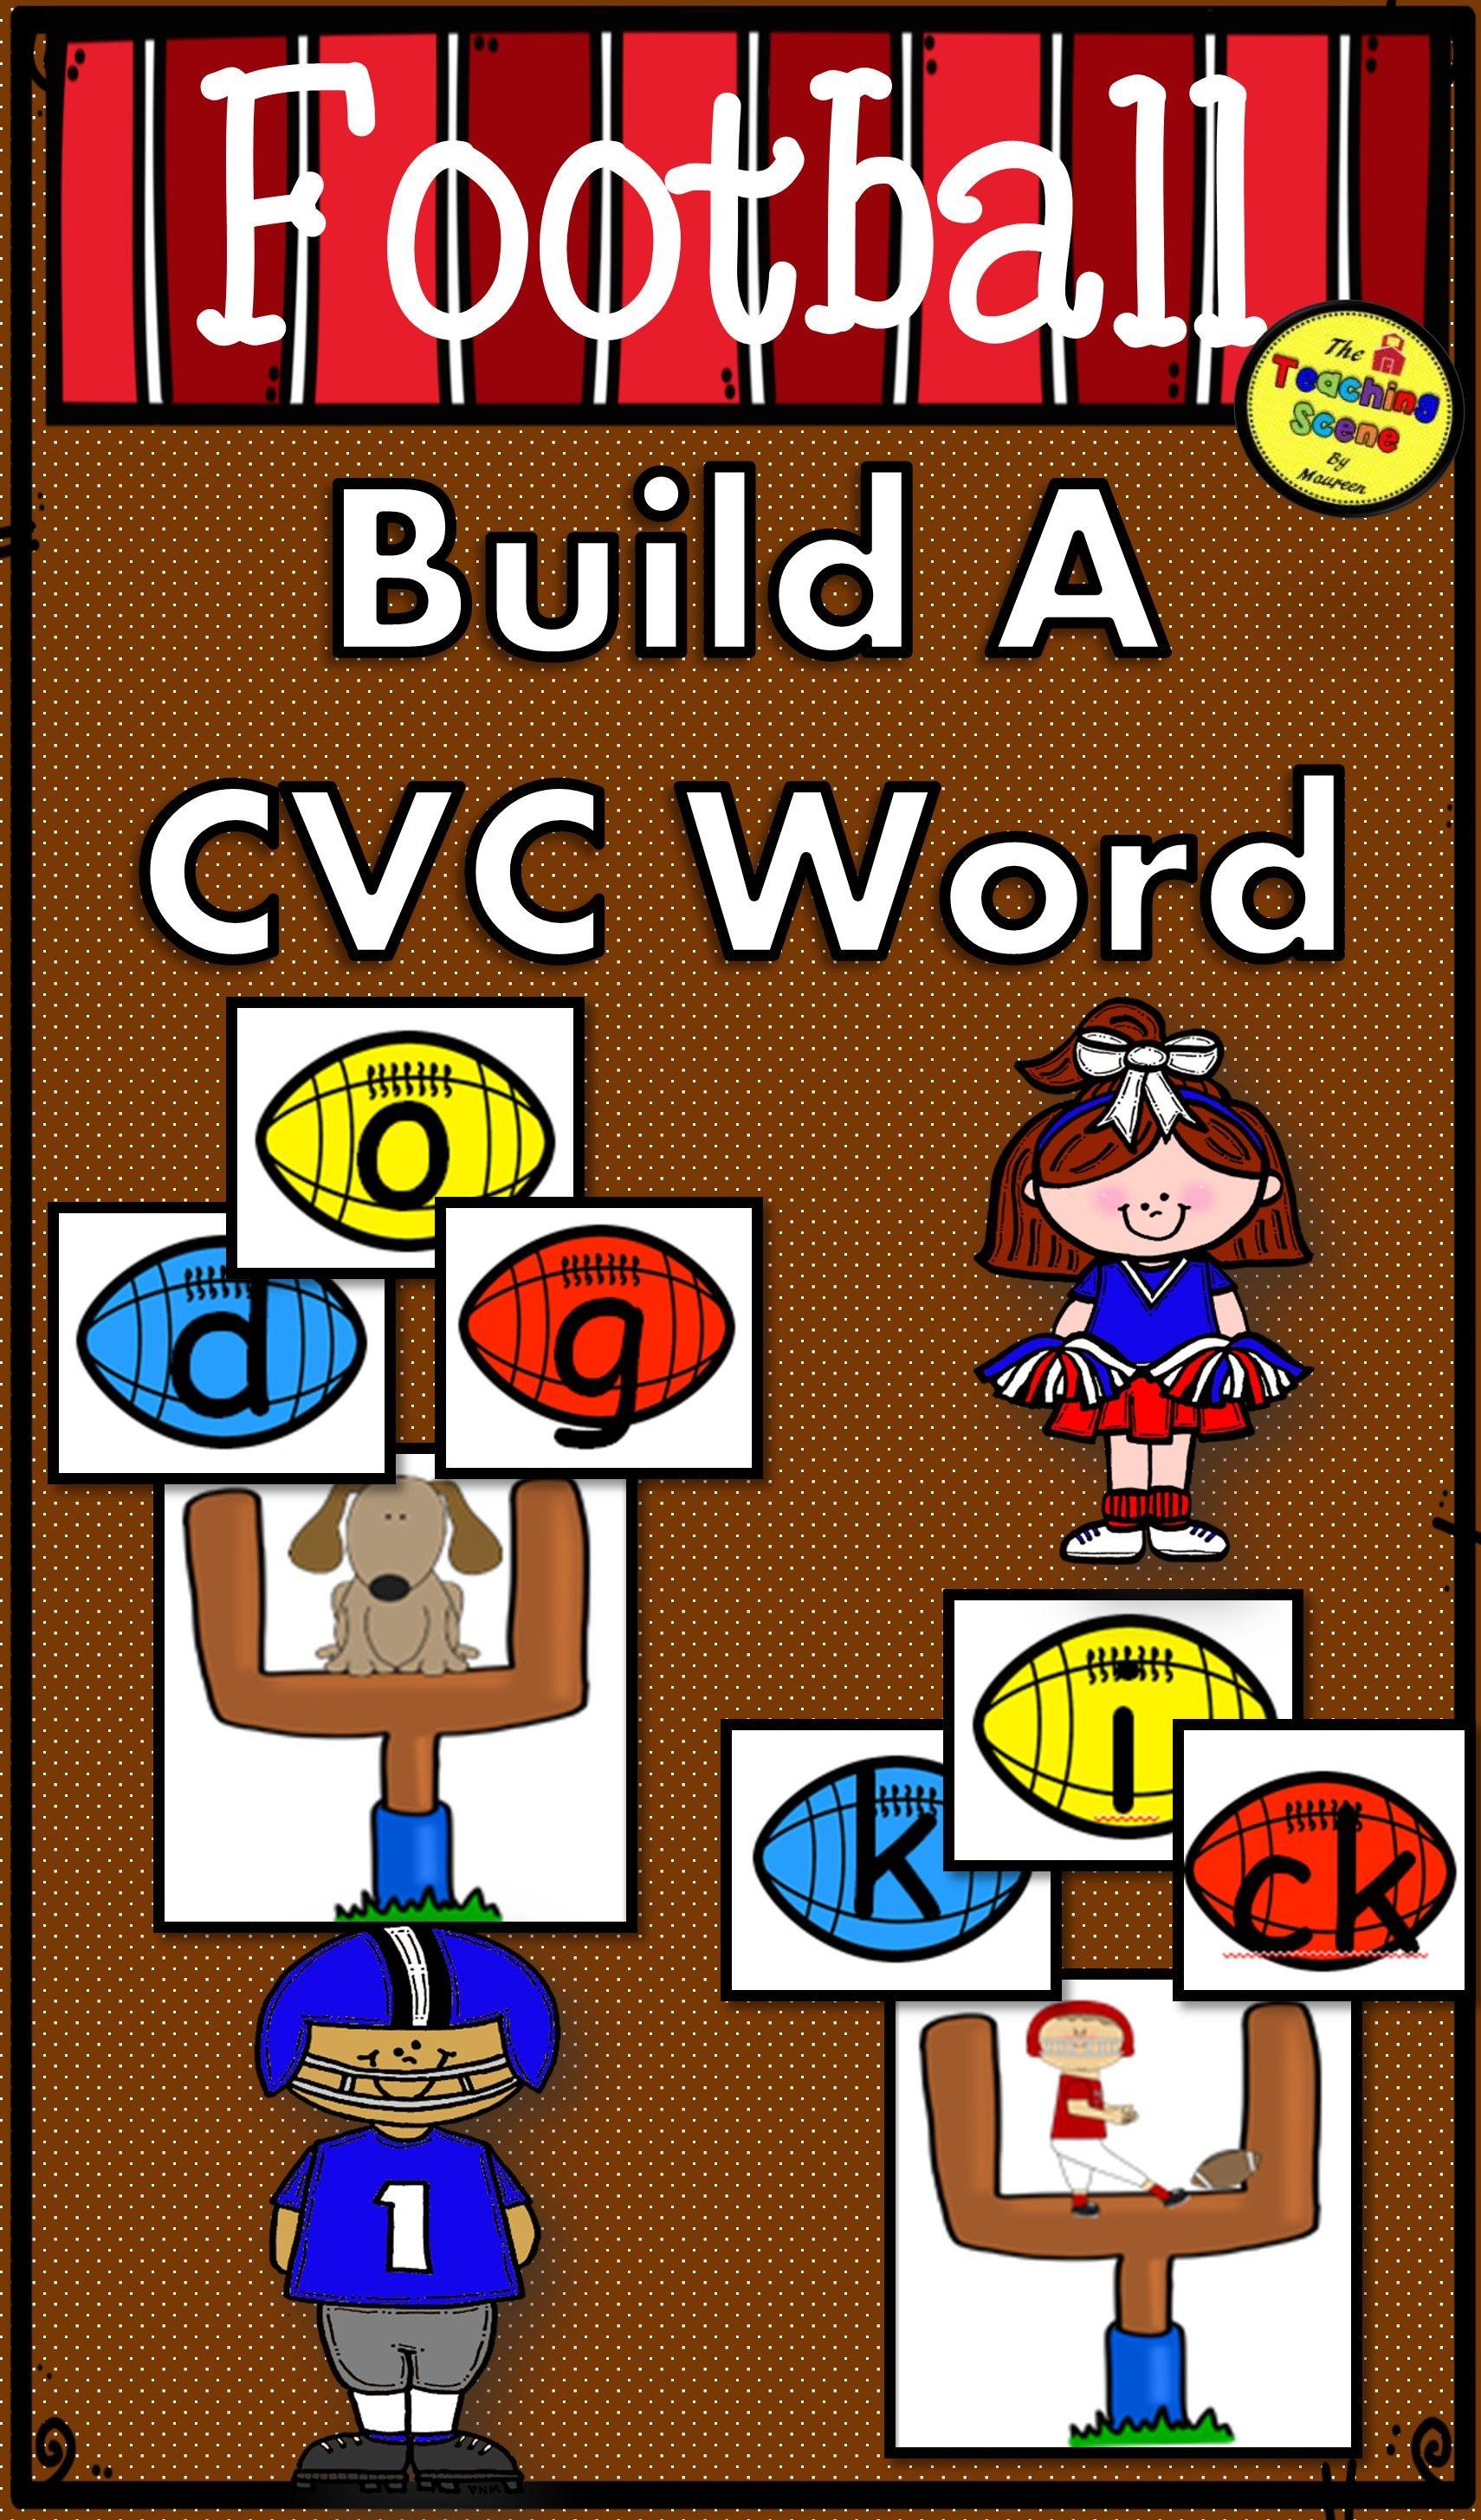 Football Build A Cvc Word Phonics Game